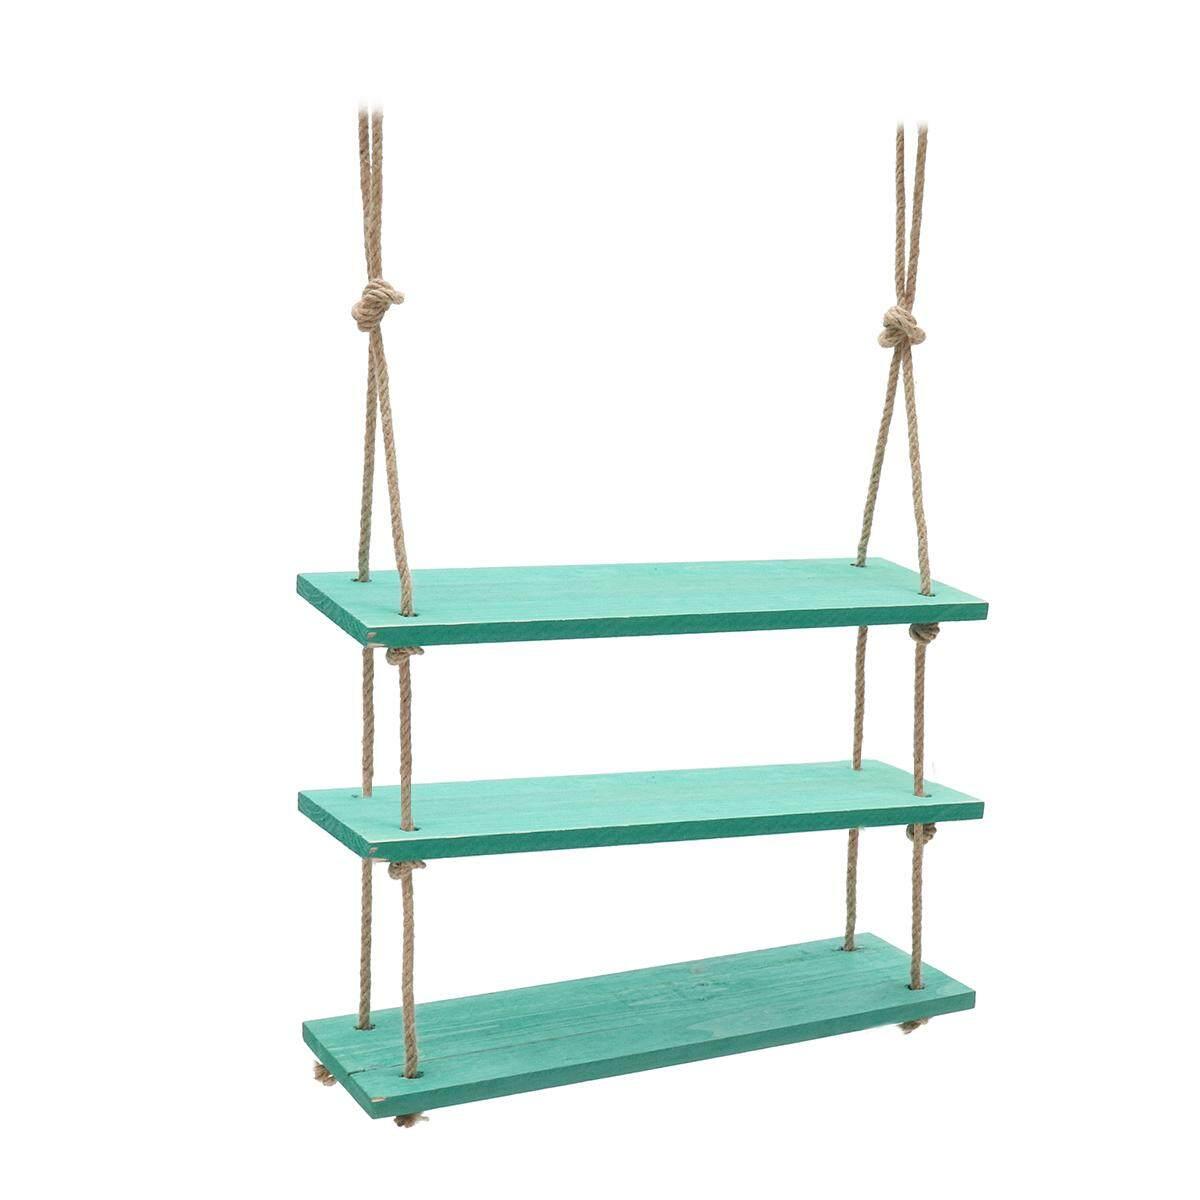 Solid Wood Wall Shelf Storage Floating Wall Shelf Rustic Vintage Rope Shelf Green 3 Tiers - intl